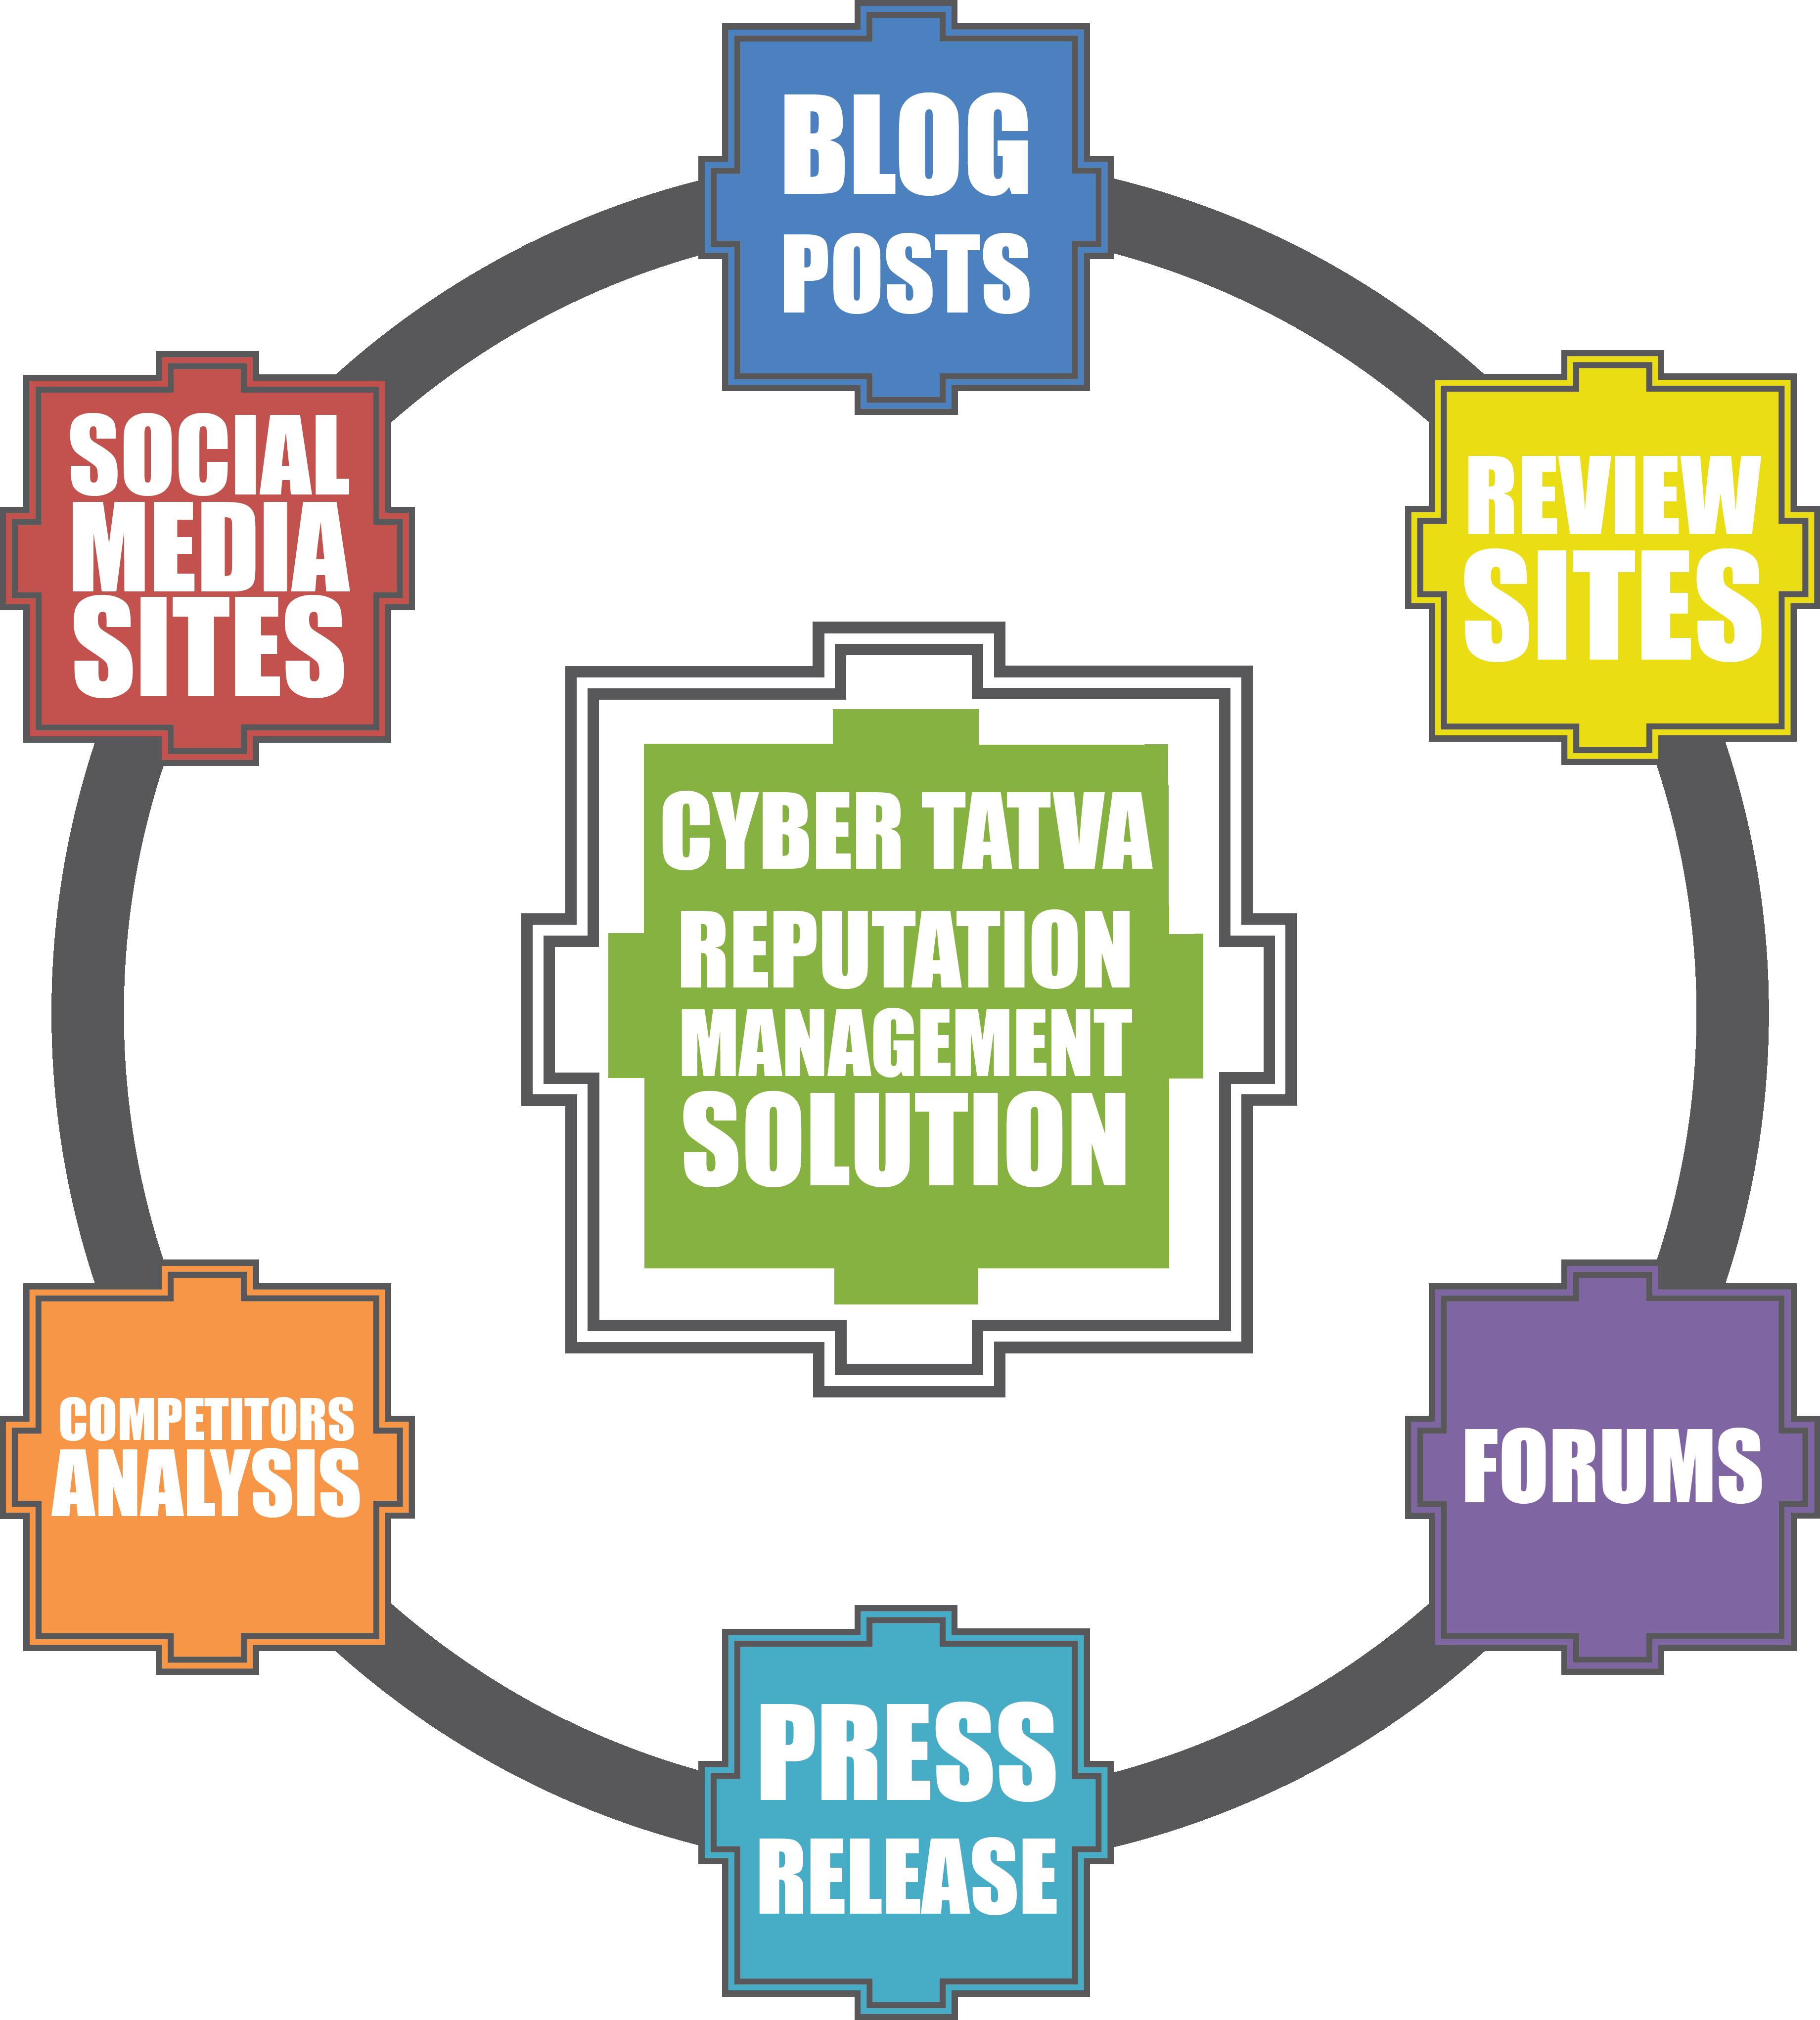 Online Reputation Management Solution